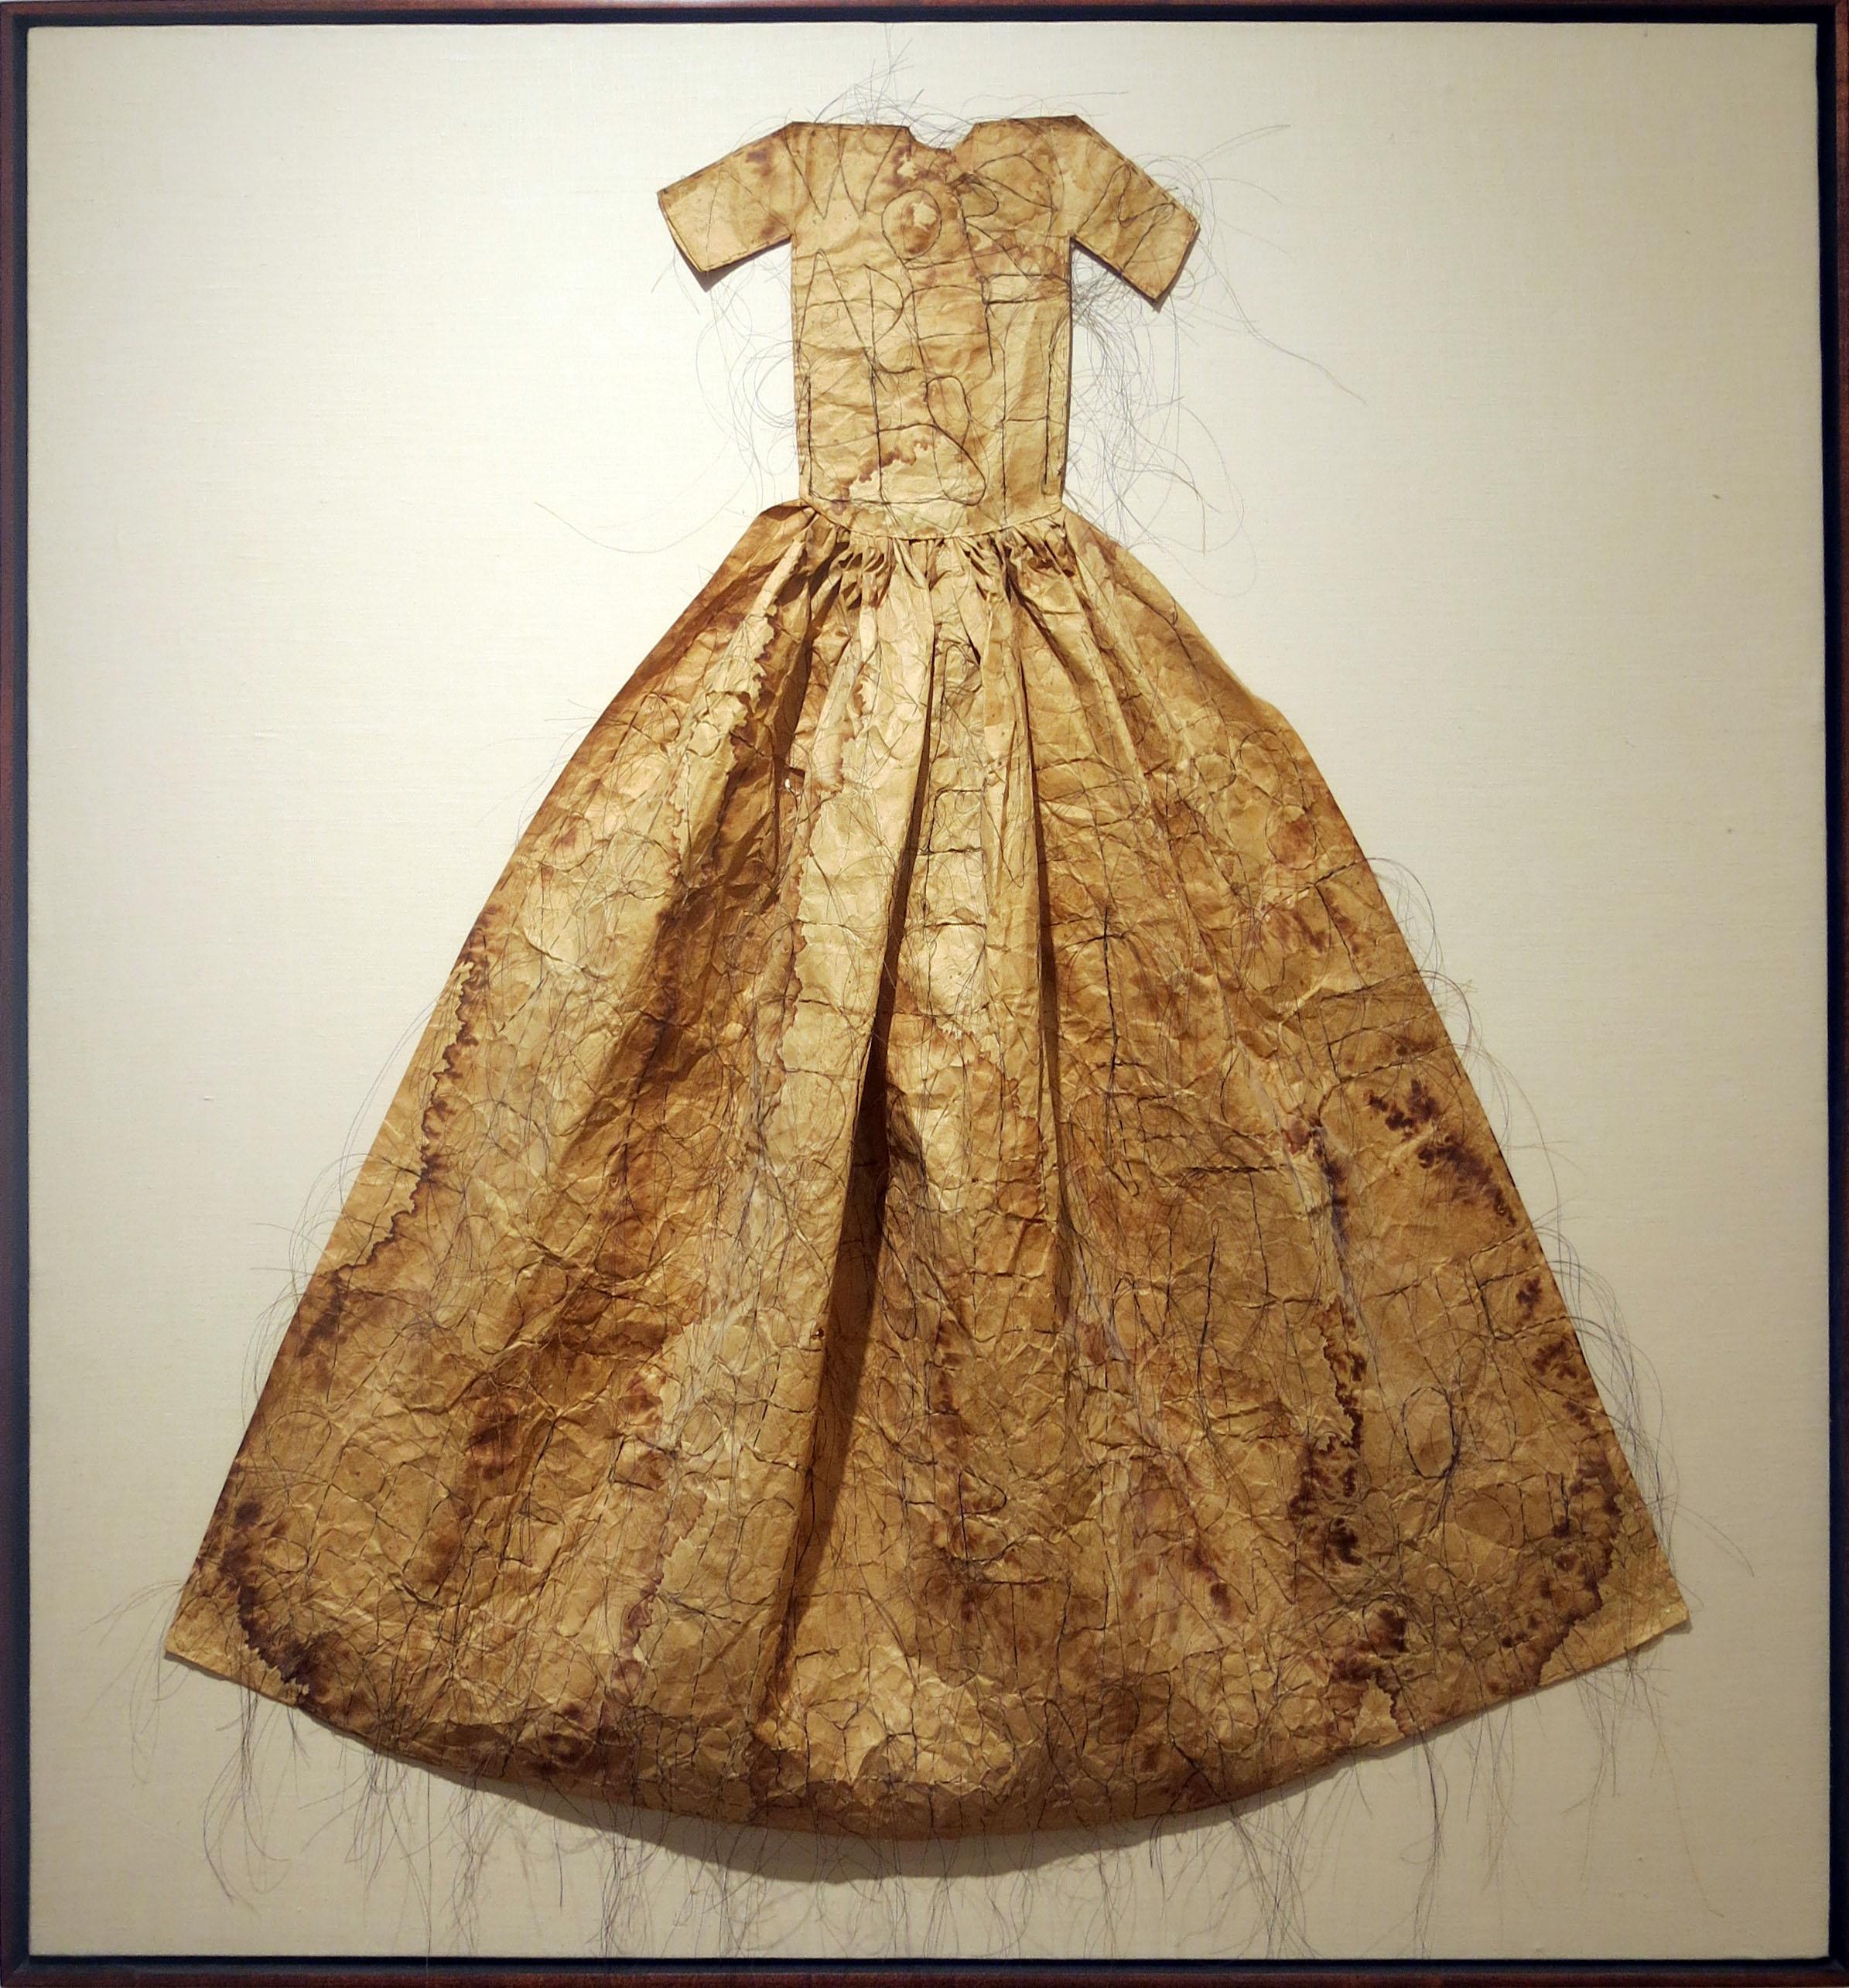 Lesly Dill,  Poem Hair Dress,  1993, horse hair, tea, rice paper, 48h x 45w x 5d in.